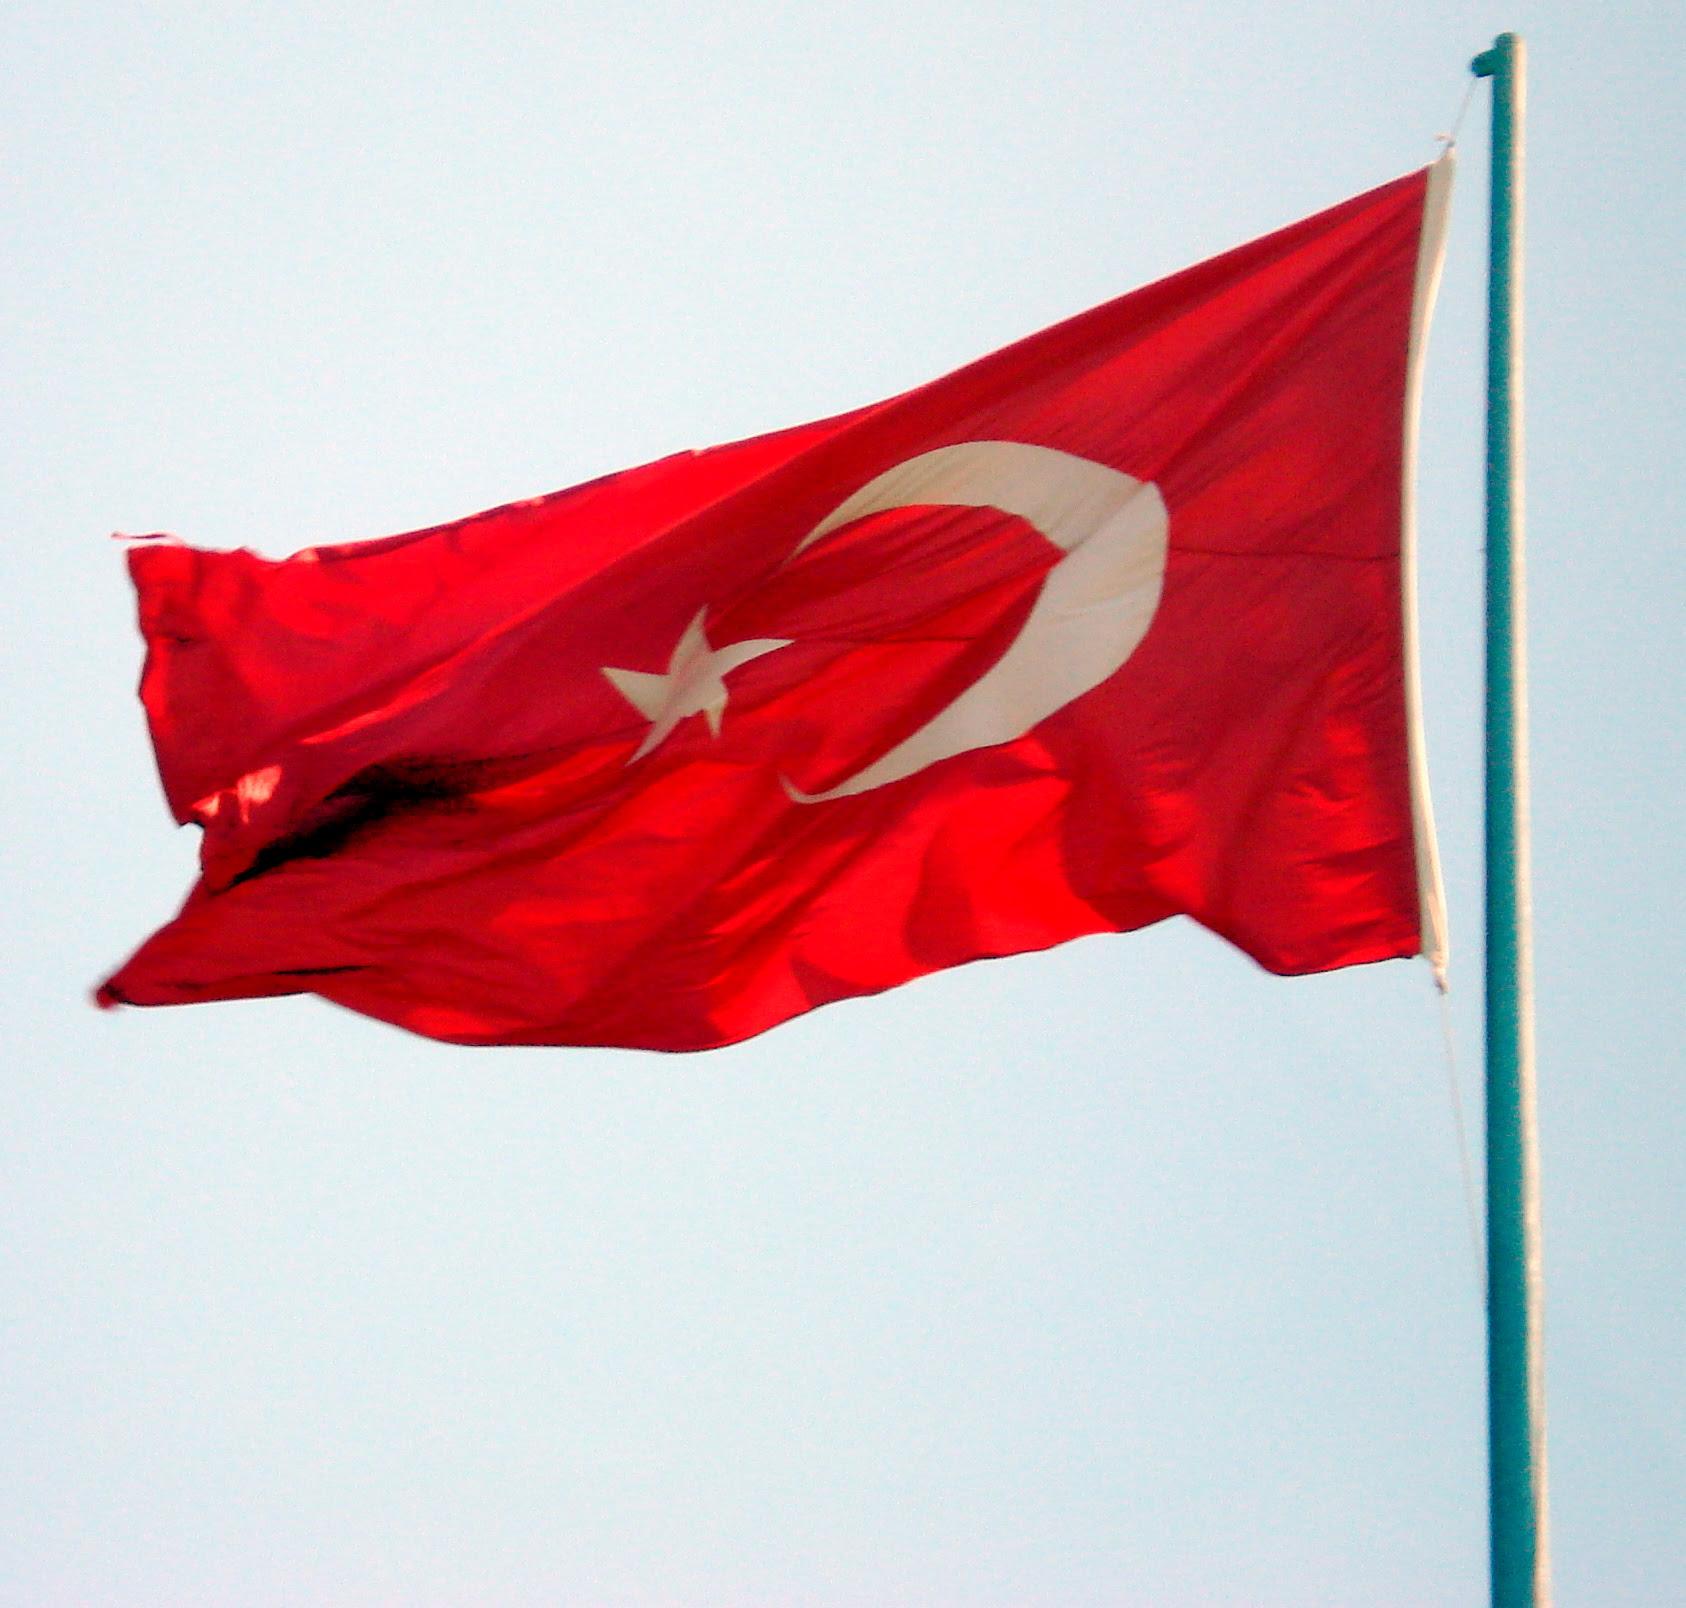 http://upload.wikimedia.org/wikipedia/commons/2/2b/Turkish_flag.JPG